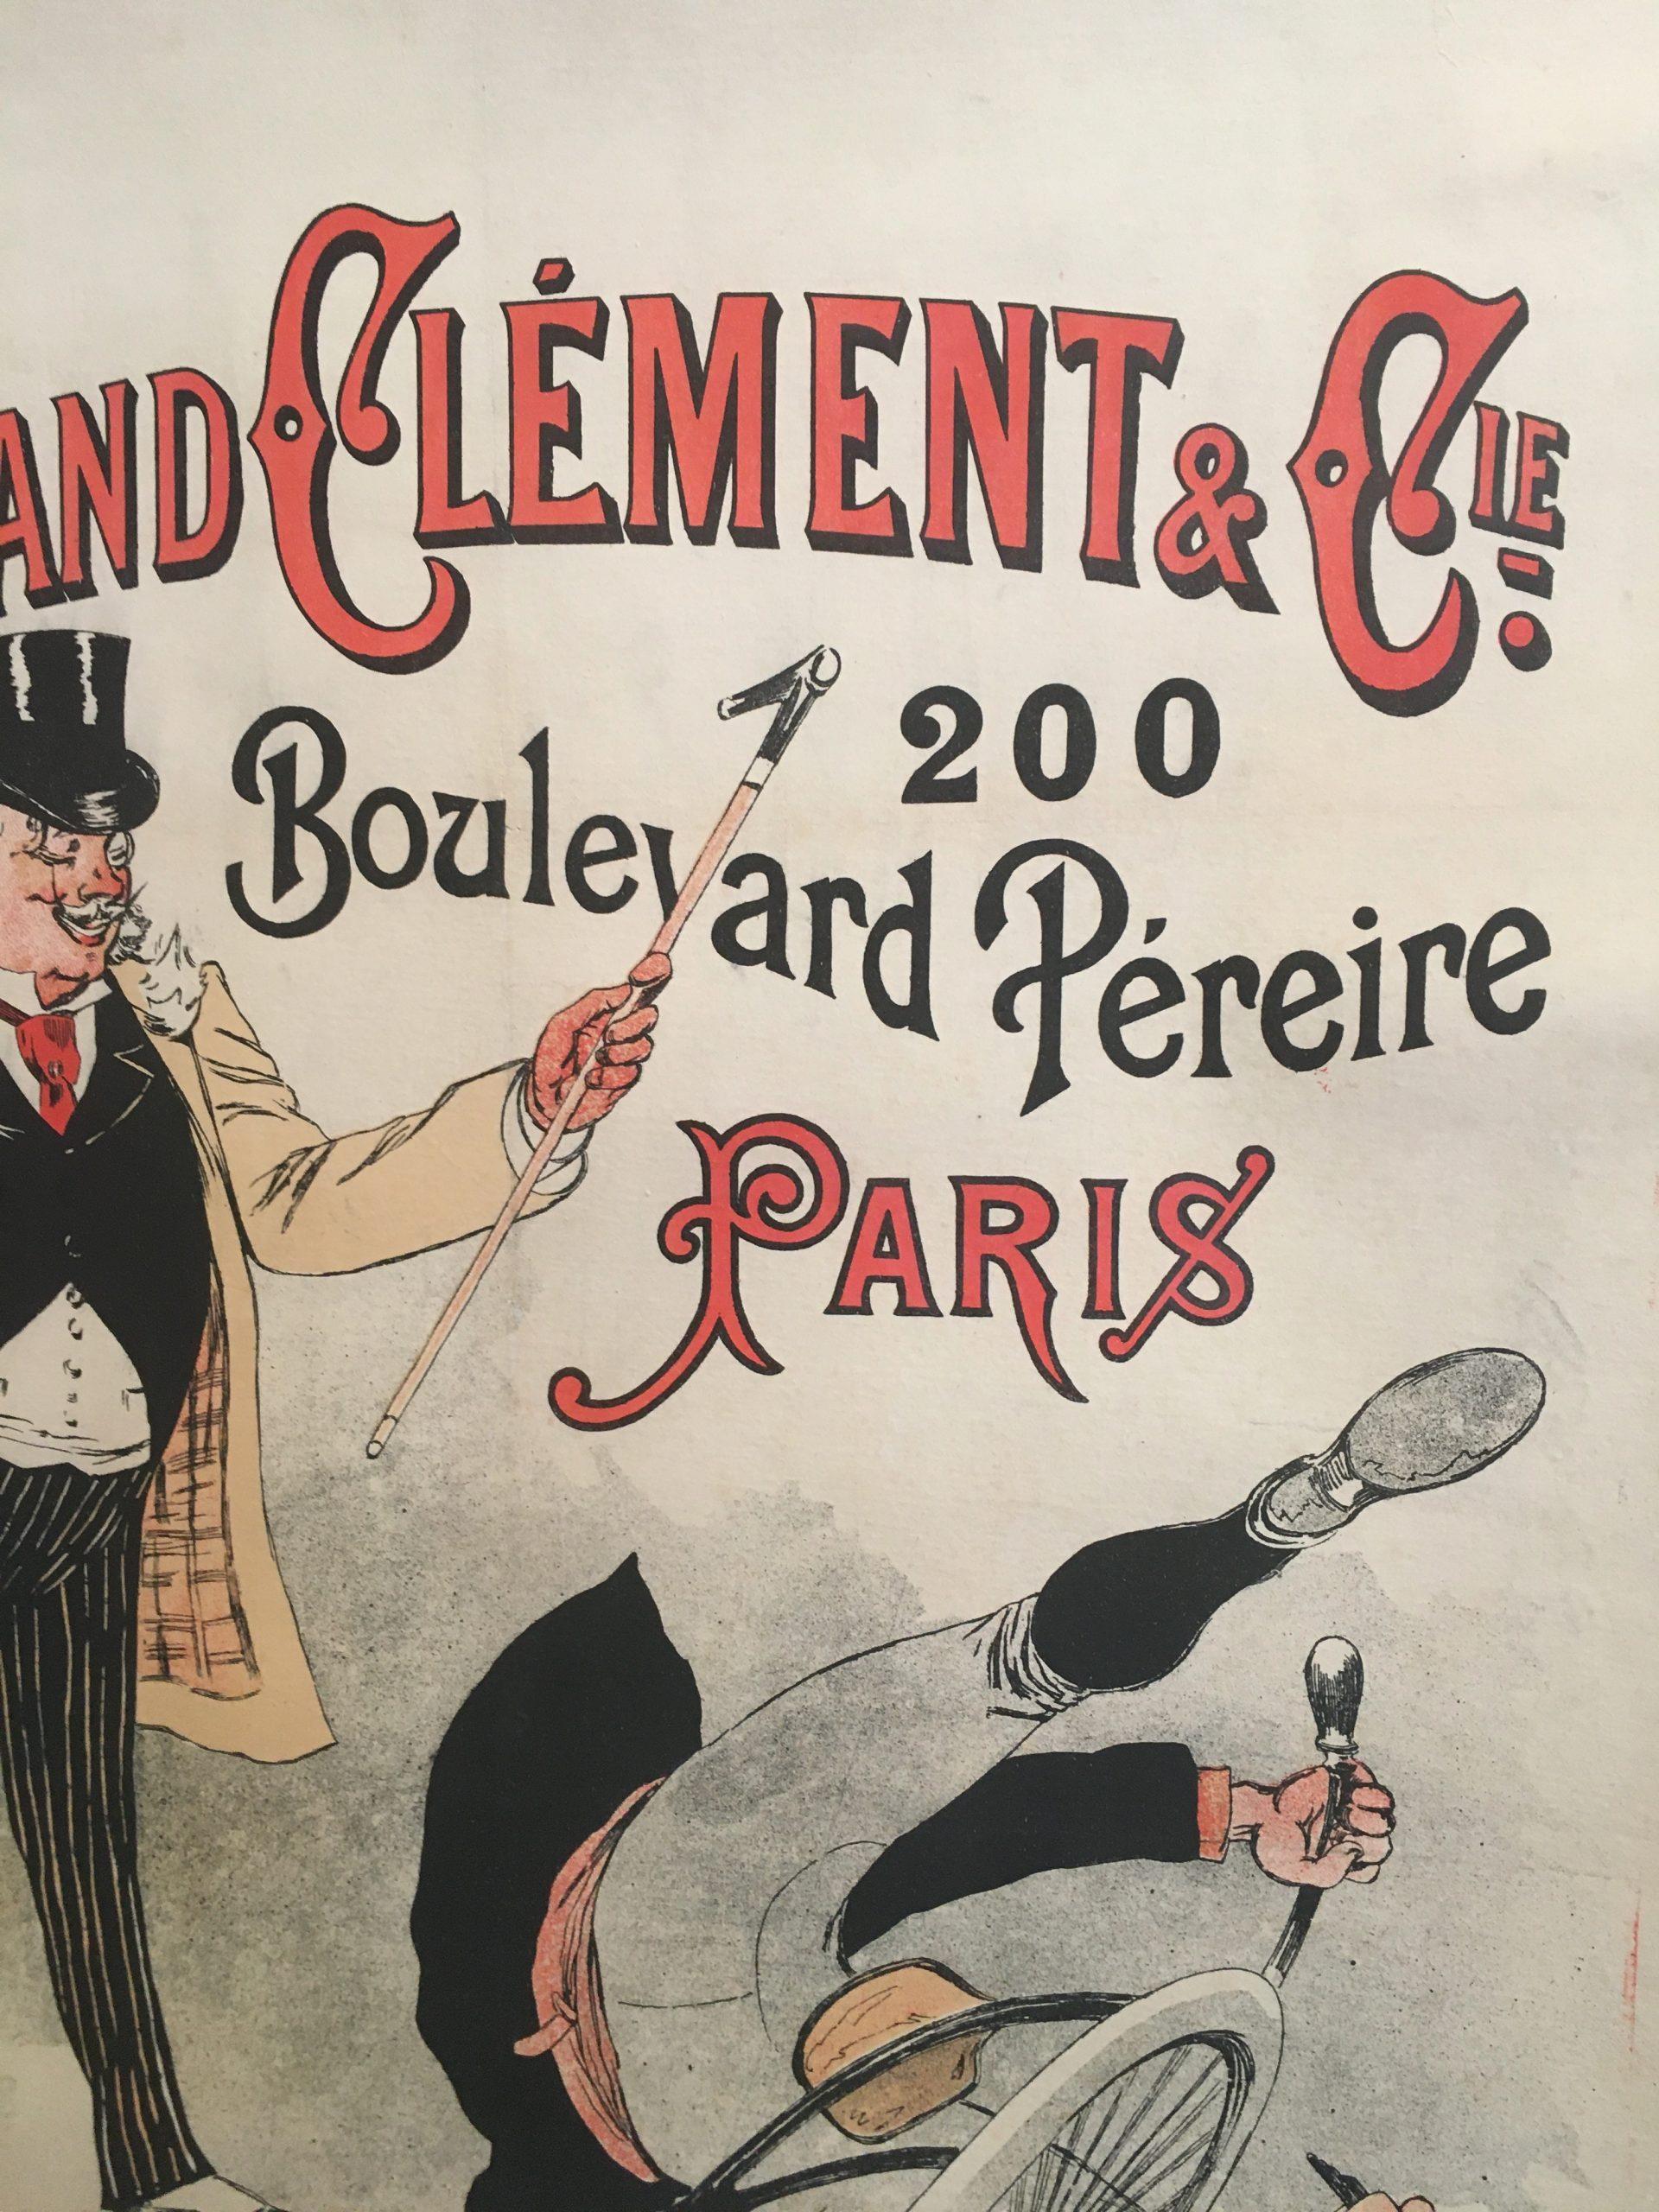 Fernand Calment & Co Late 18th Century Original Vintage Poster